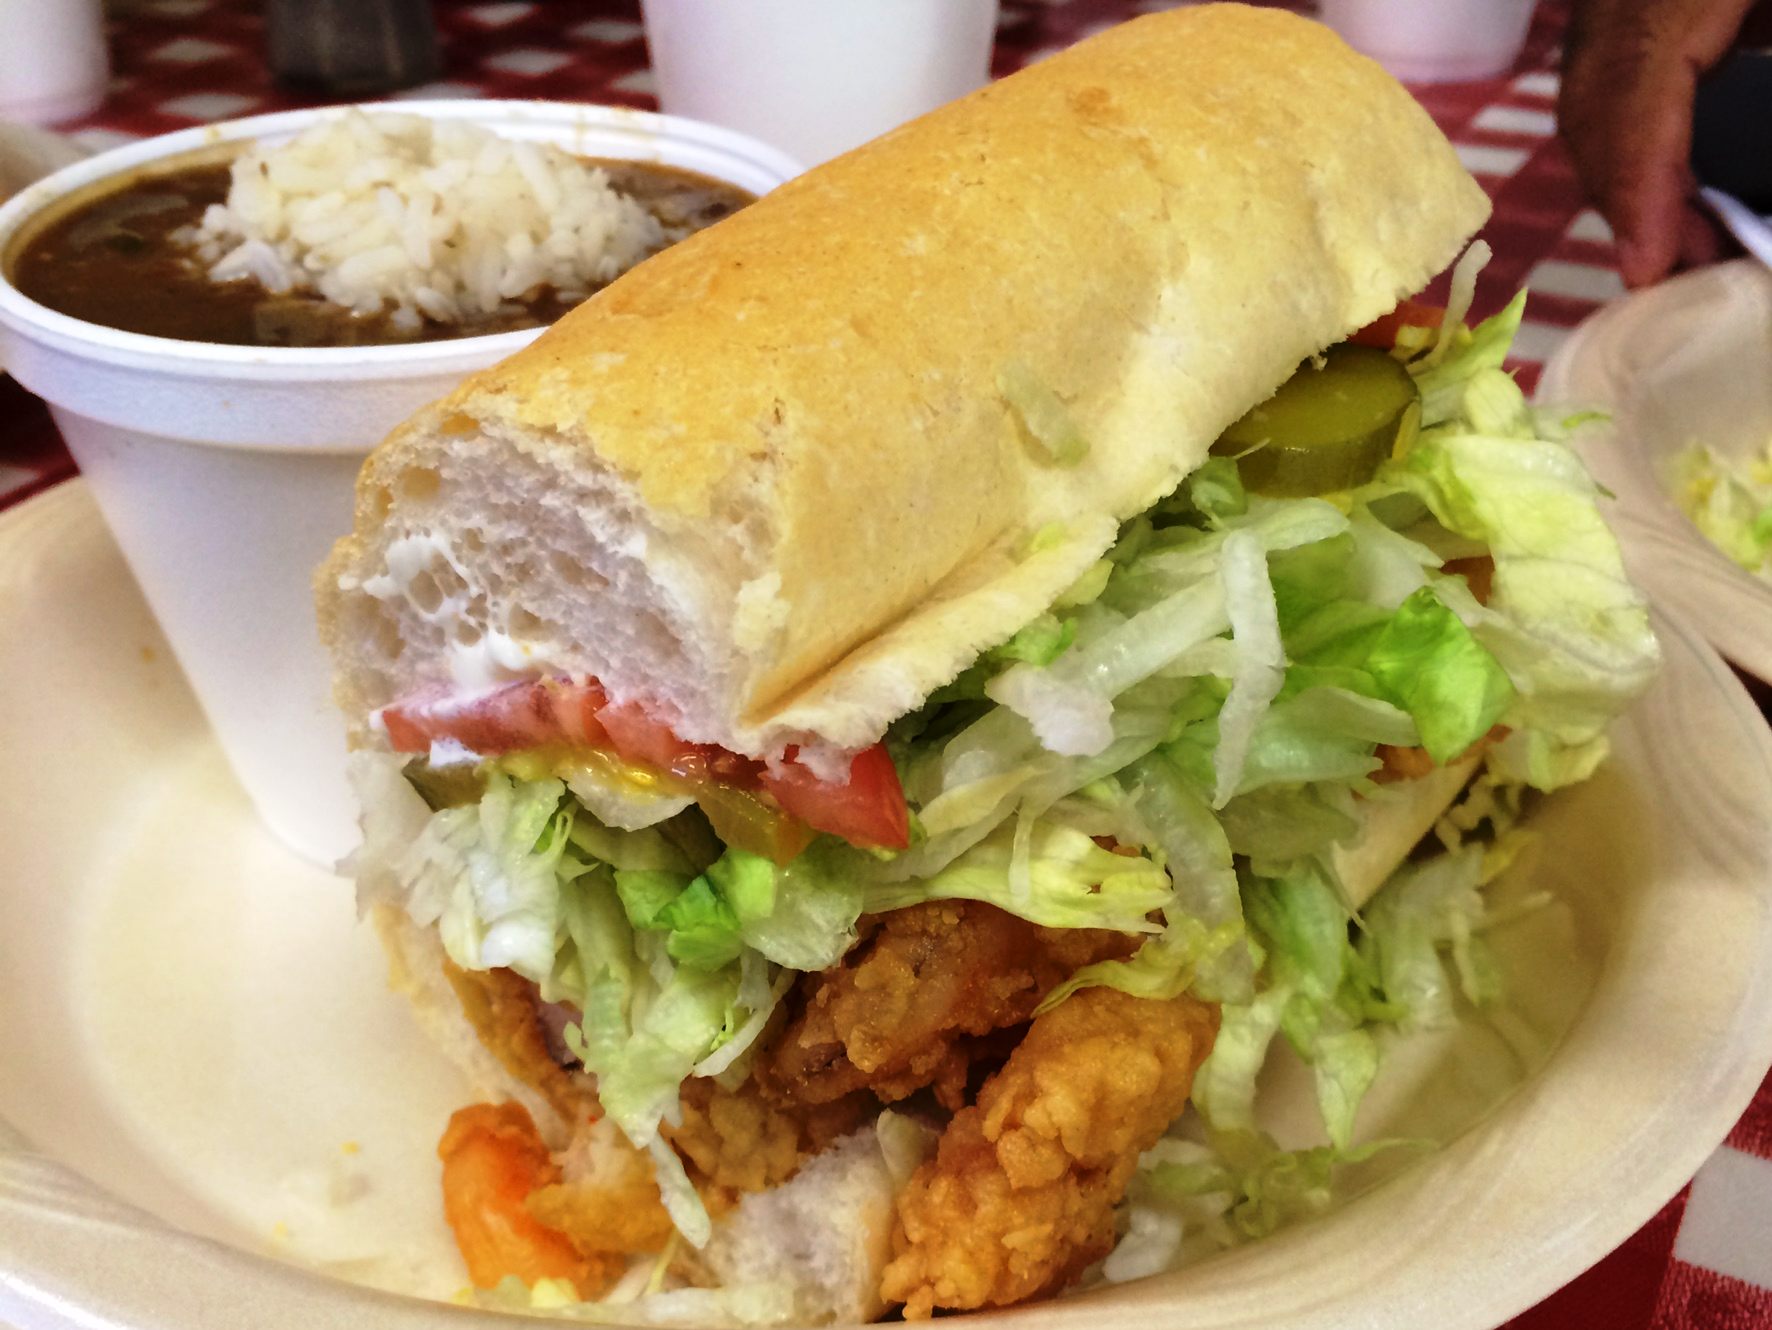 New Orleans Johnny's Po-Boys - shrimp po-boy and gumbo